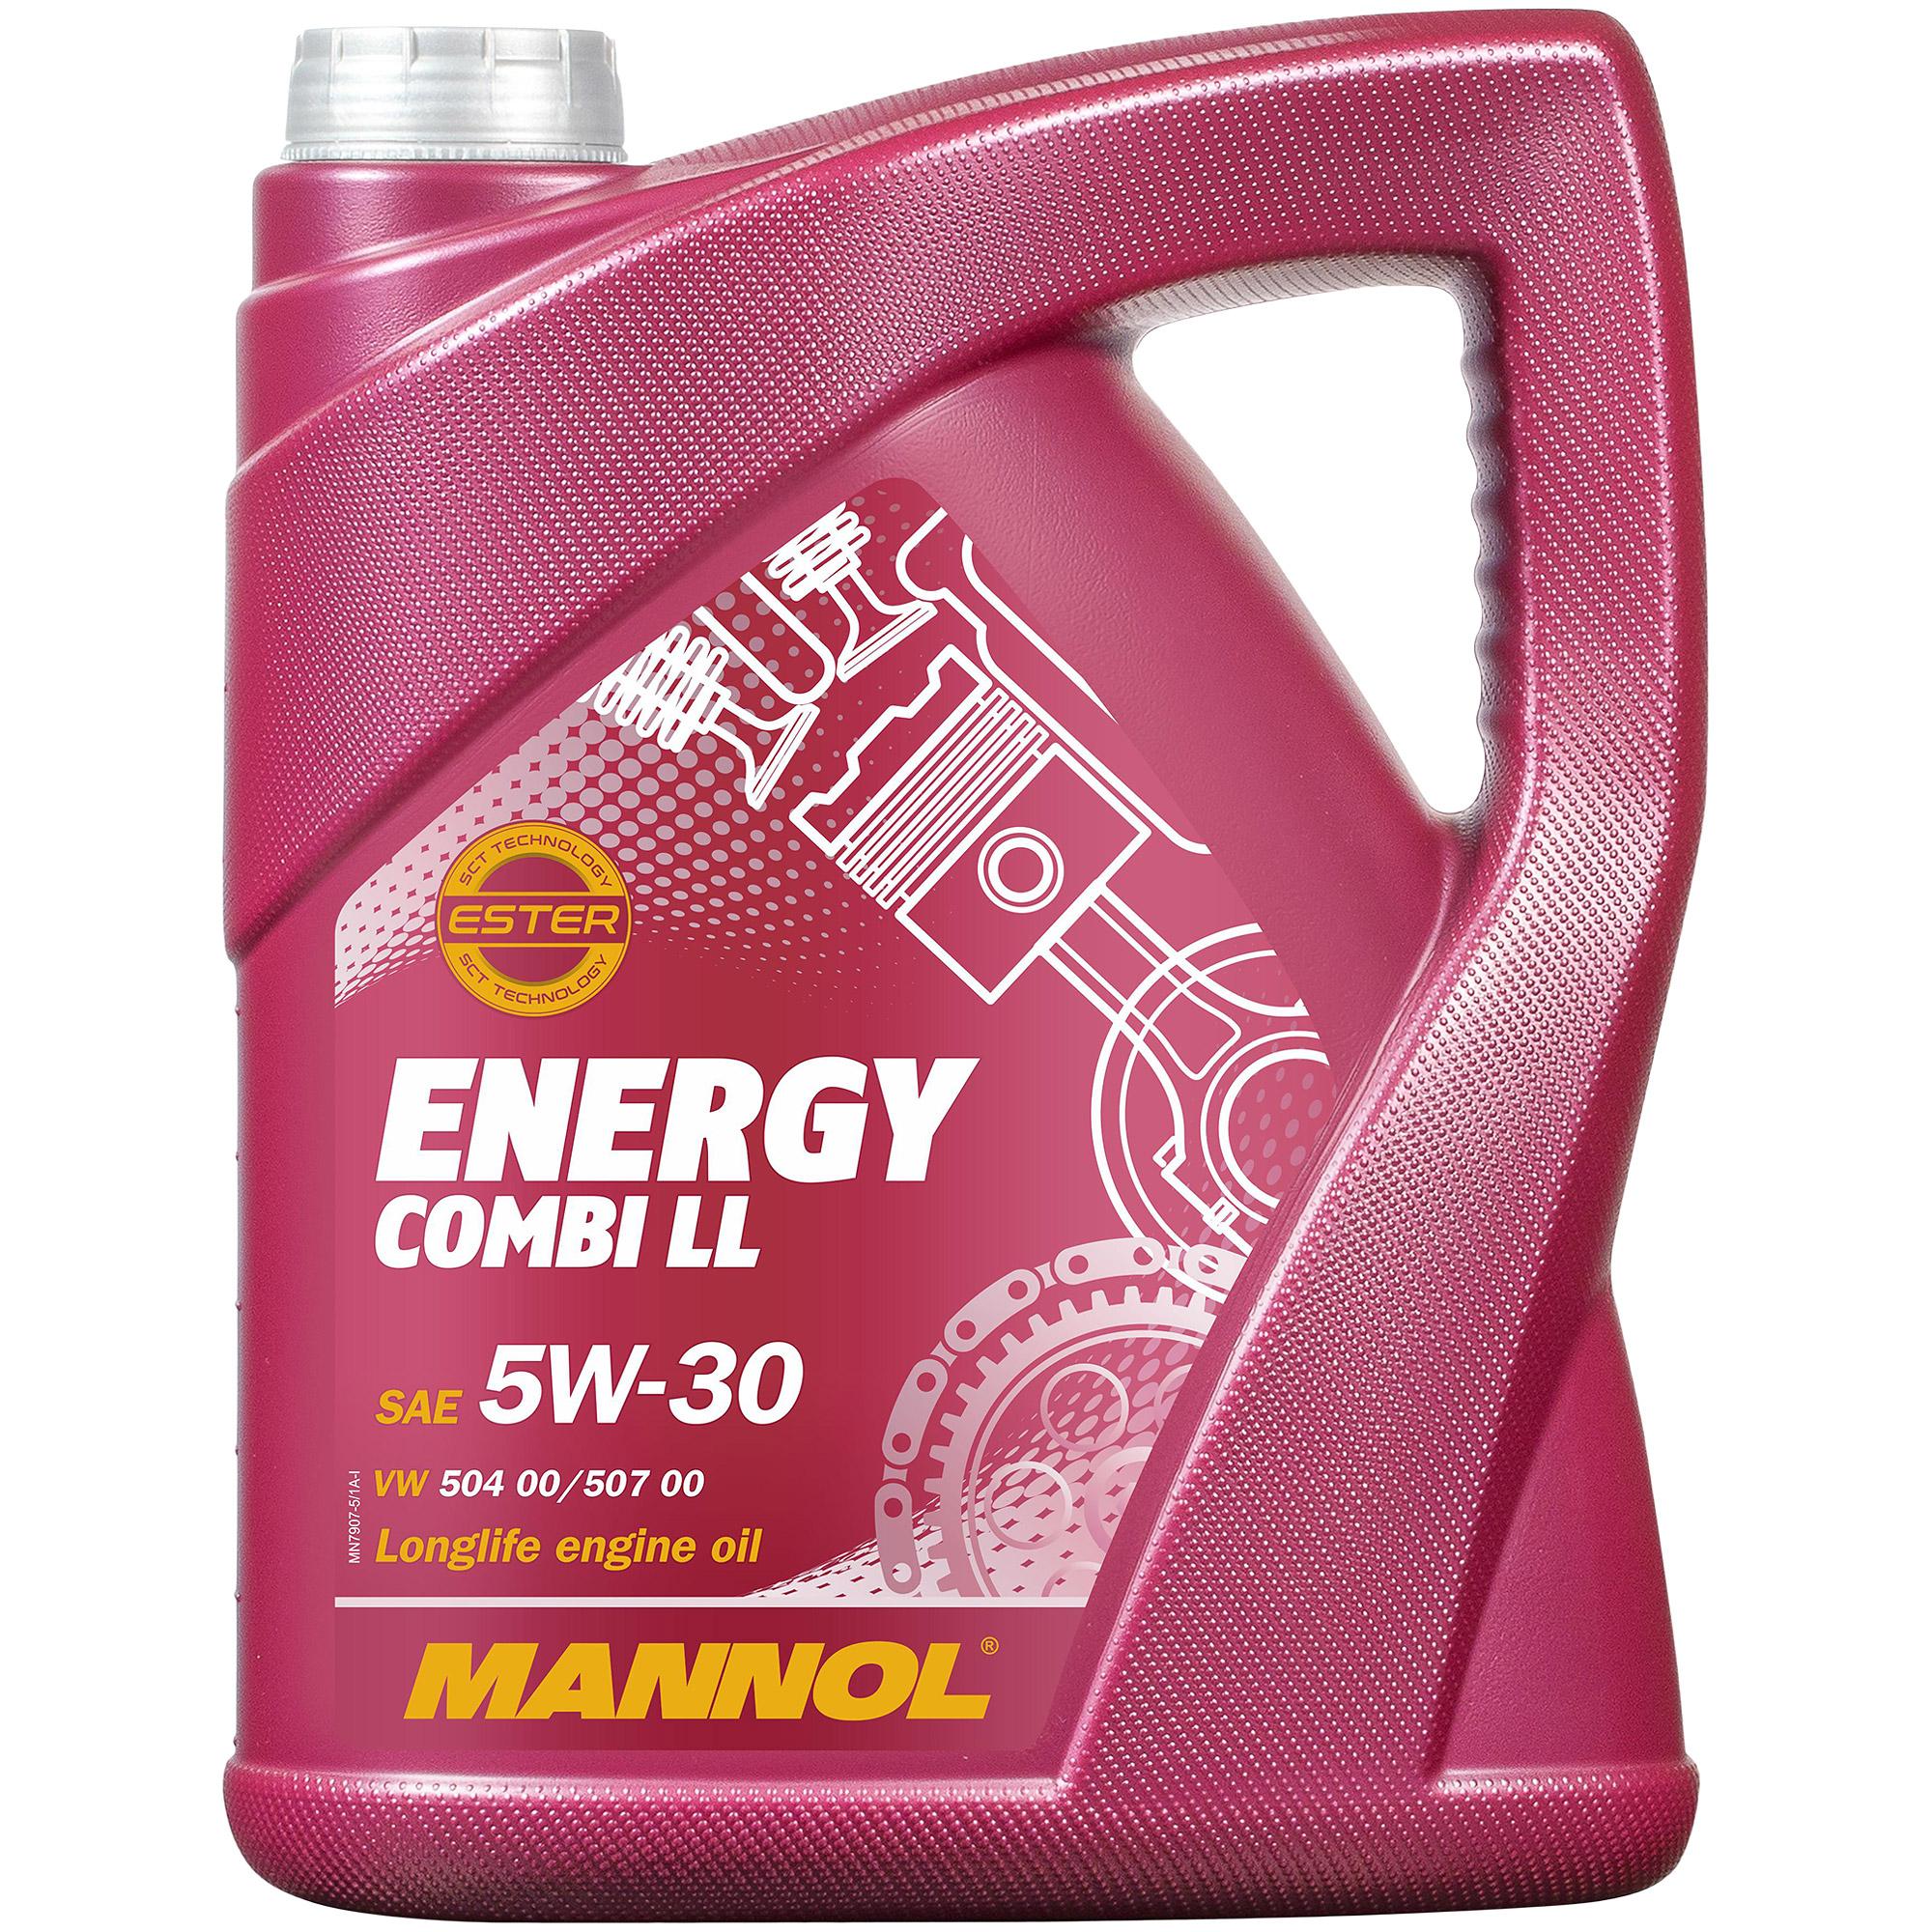 5l-aceite-del-motor-MANNOL-5w-40-10w-40-15w-40-5w-30-motorspulung-motor-flush-limpiador miniatura 21